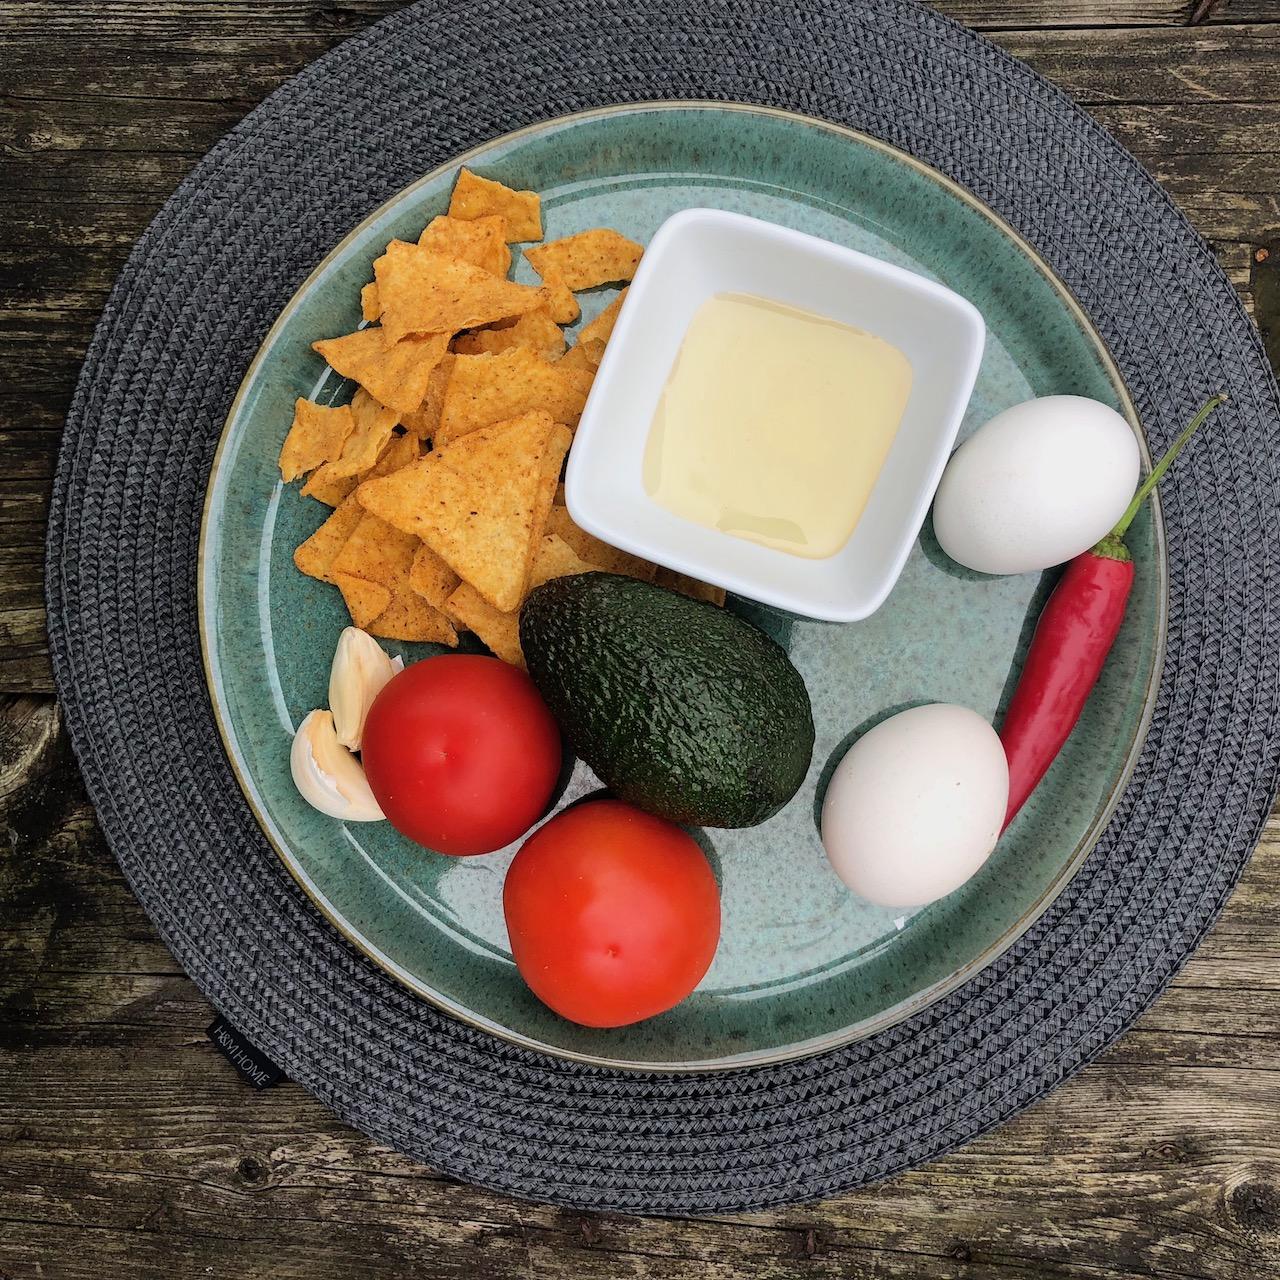 Ovos - Nachos - Alho - Tomate - Abacate - Pimentão vermelho - Xarope